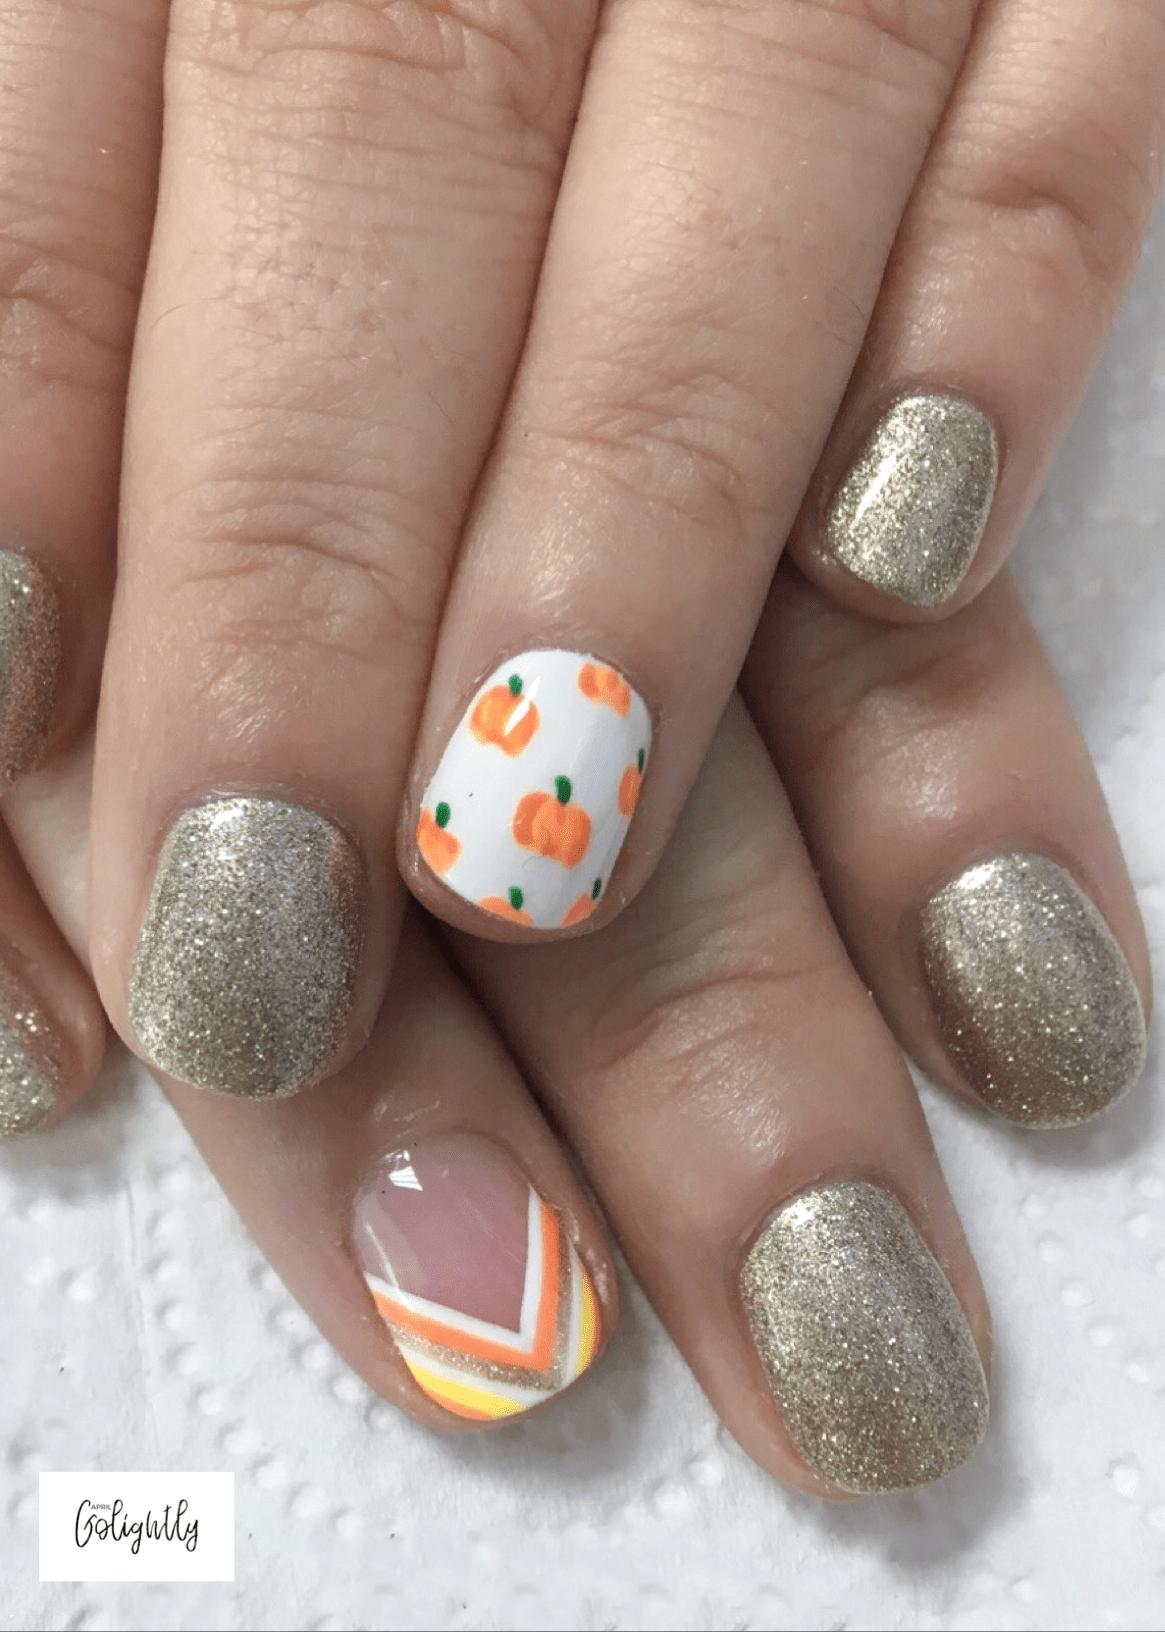 nail polish ideas for thanksgiving nail art designs pinterest